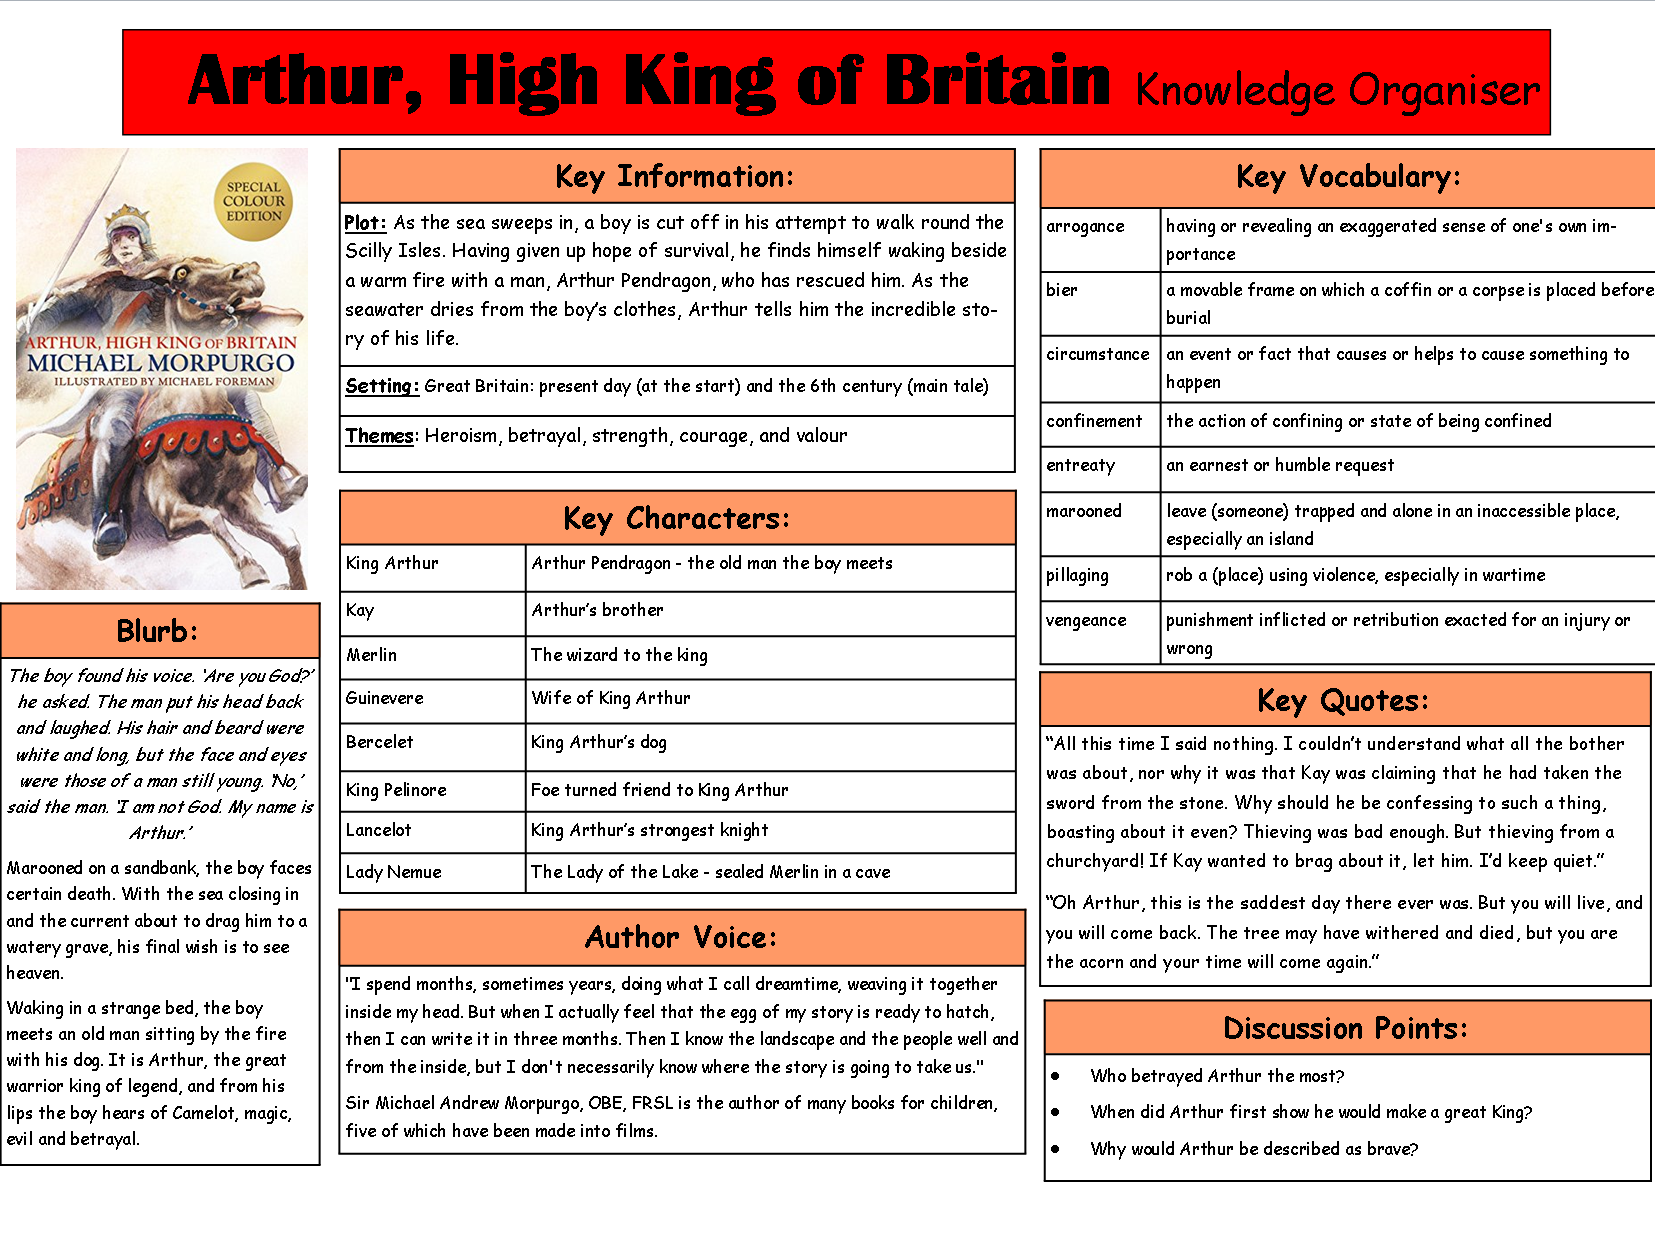 Arthur, High King of Britain Knowledge Organiser